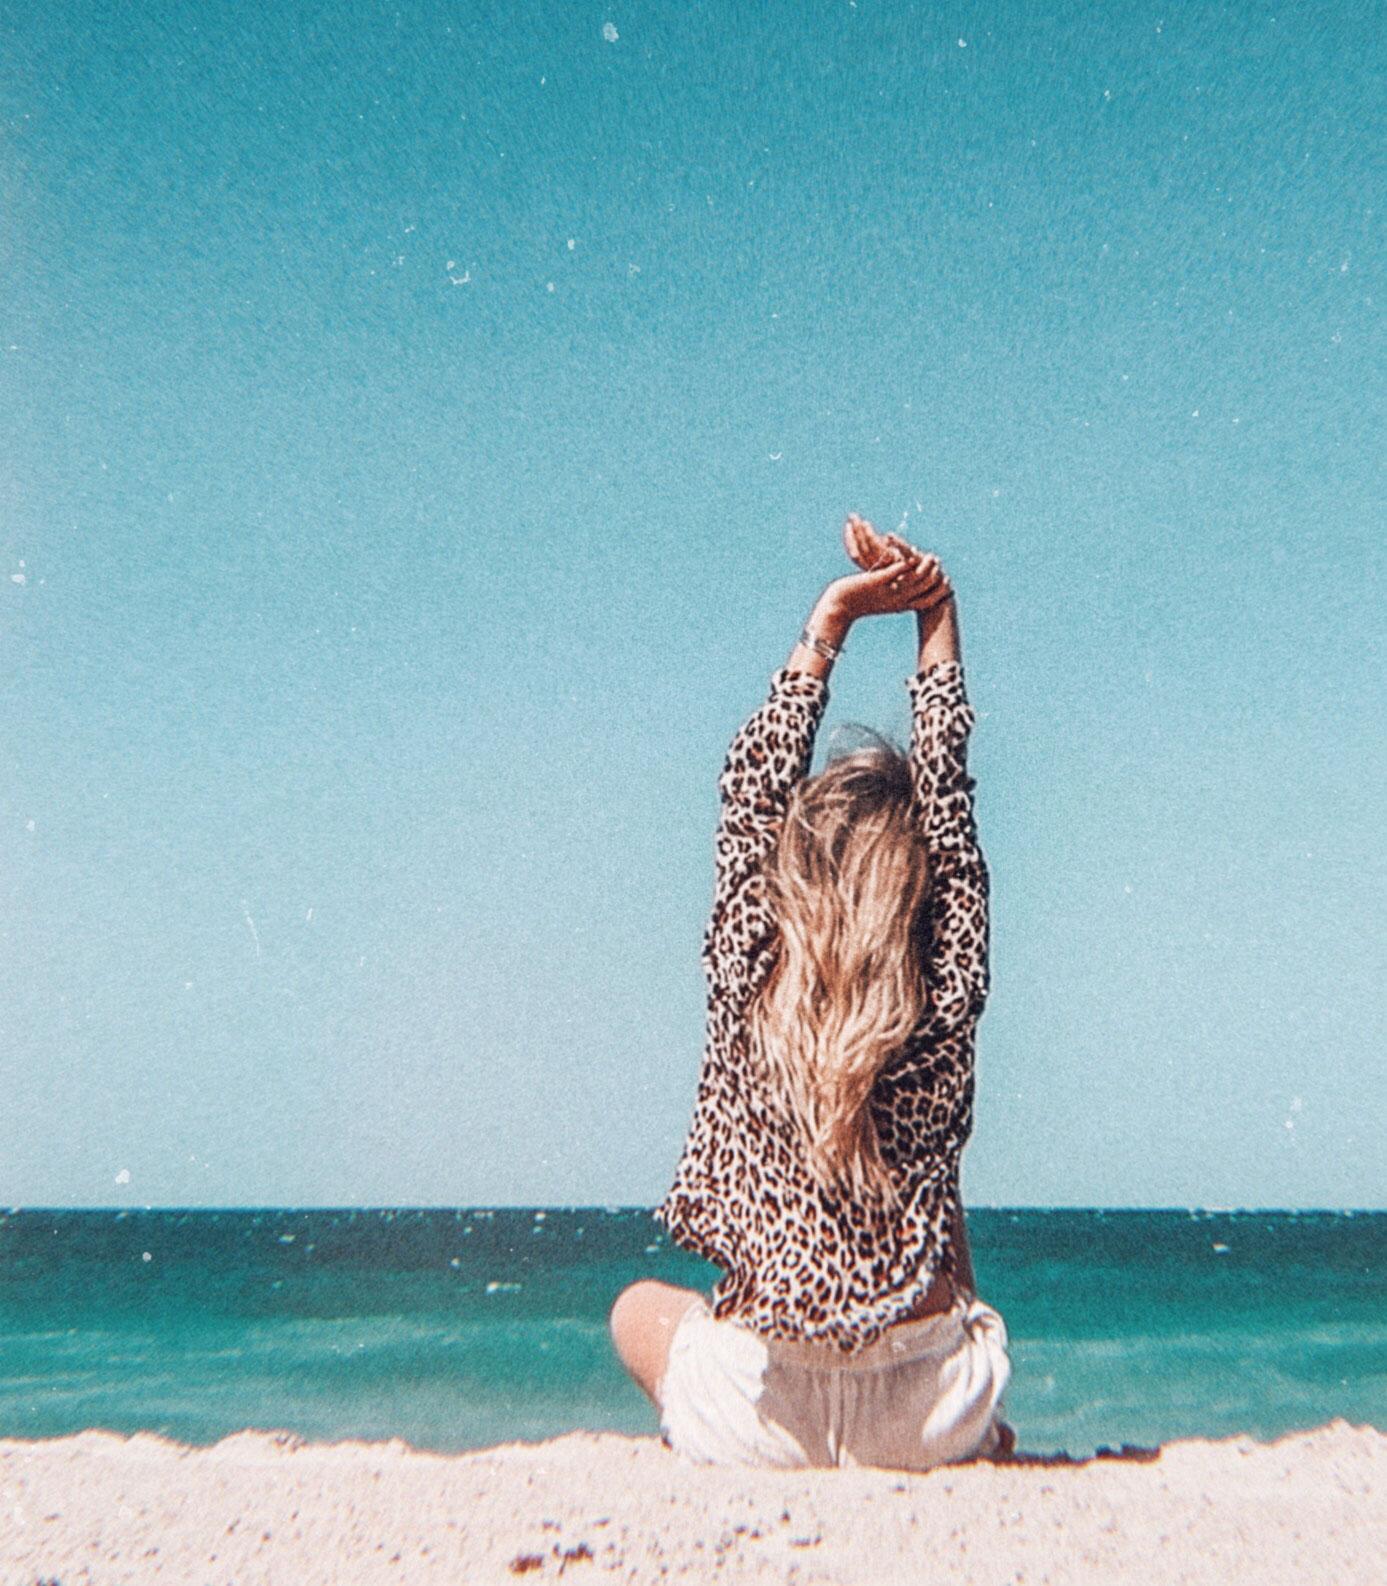 Beach Stretch Travel Photography / Dubai Travel Tips